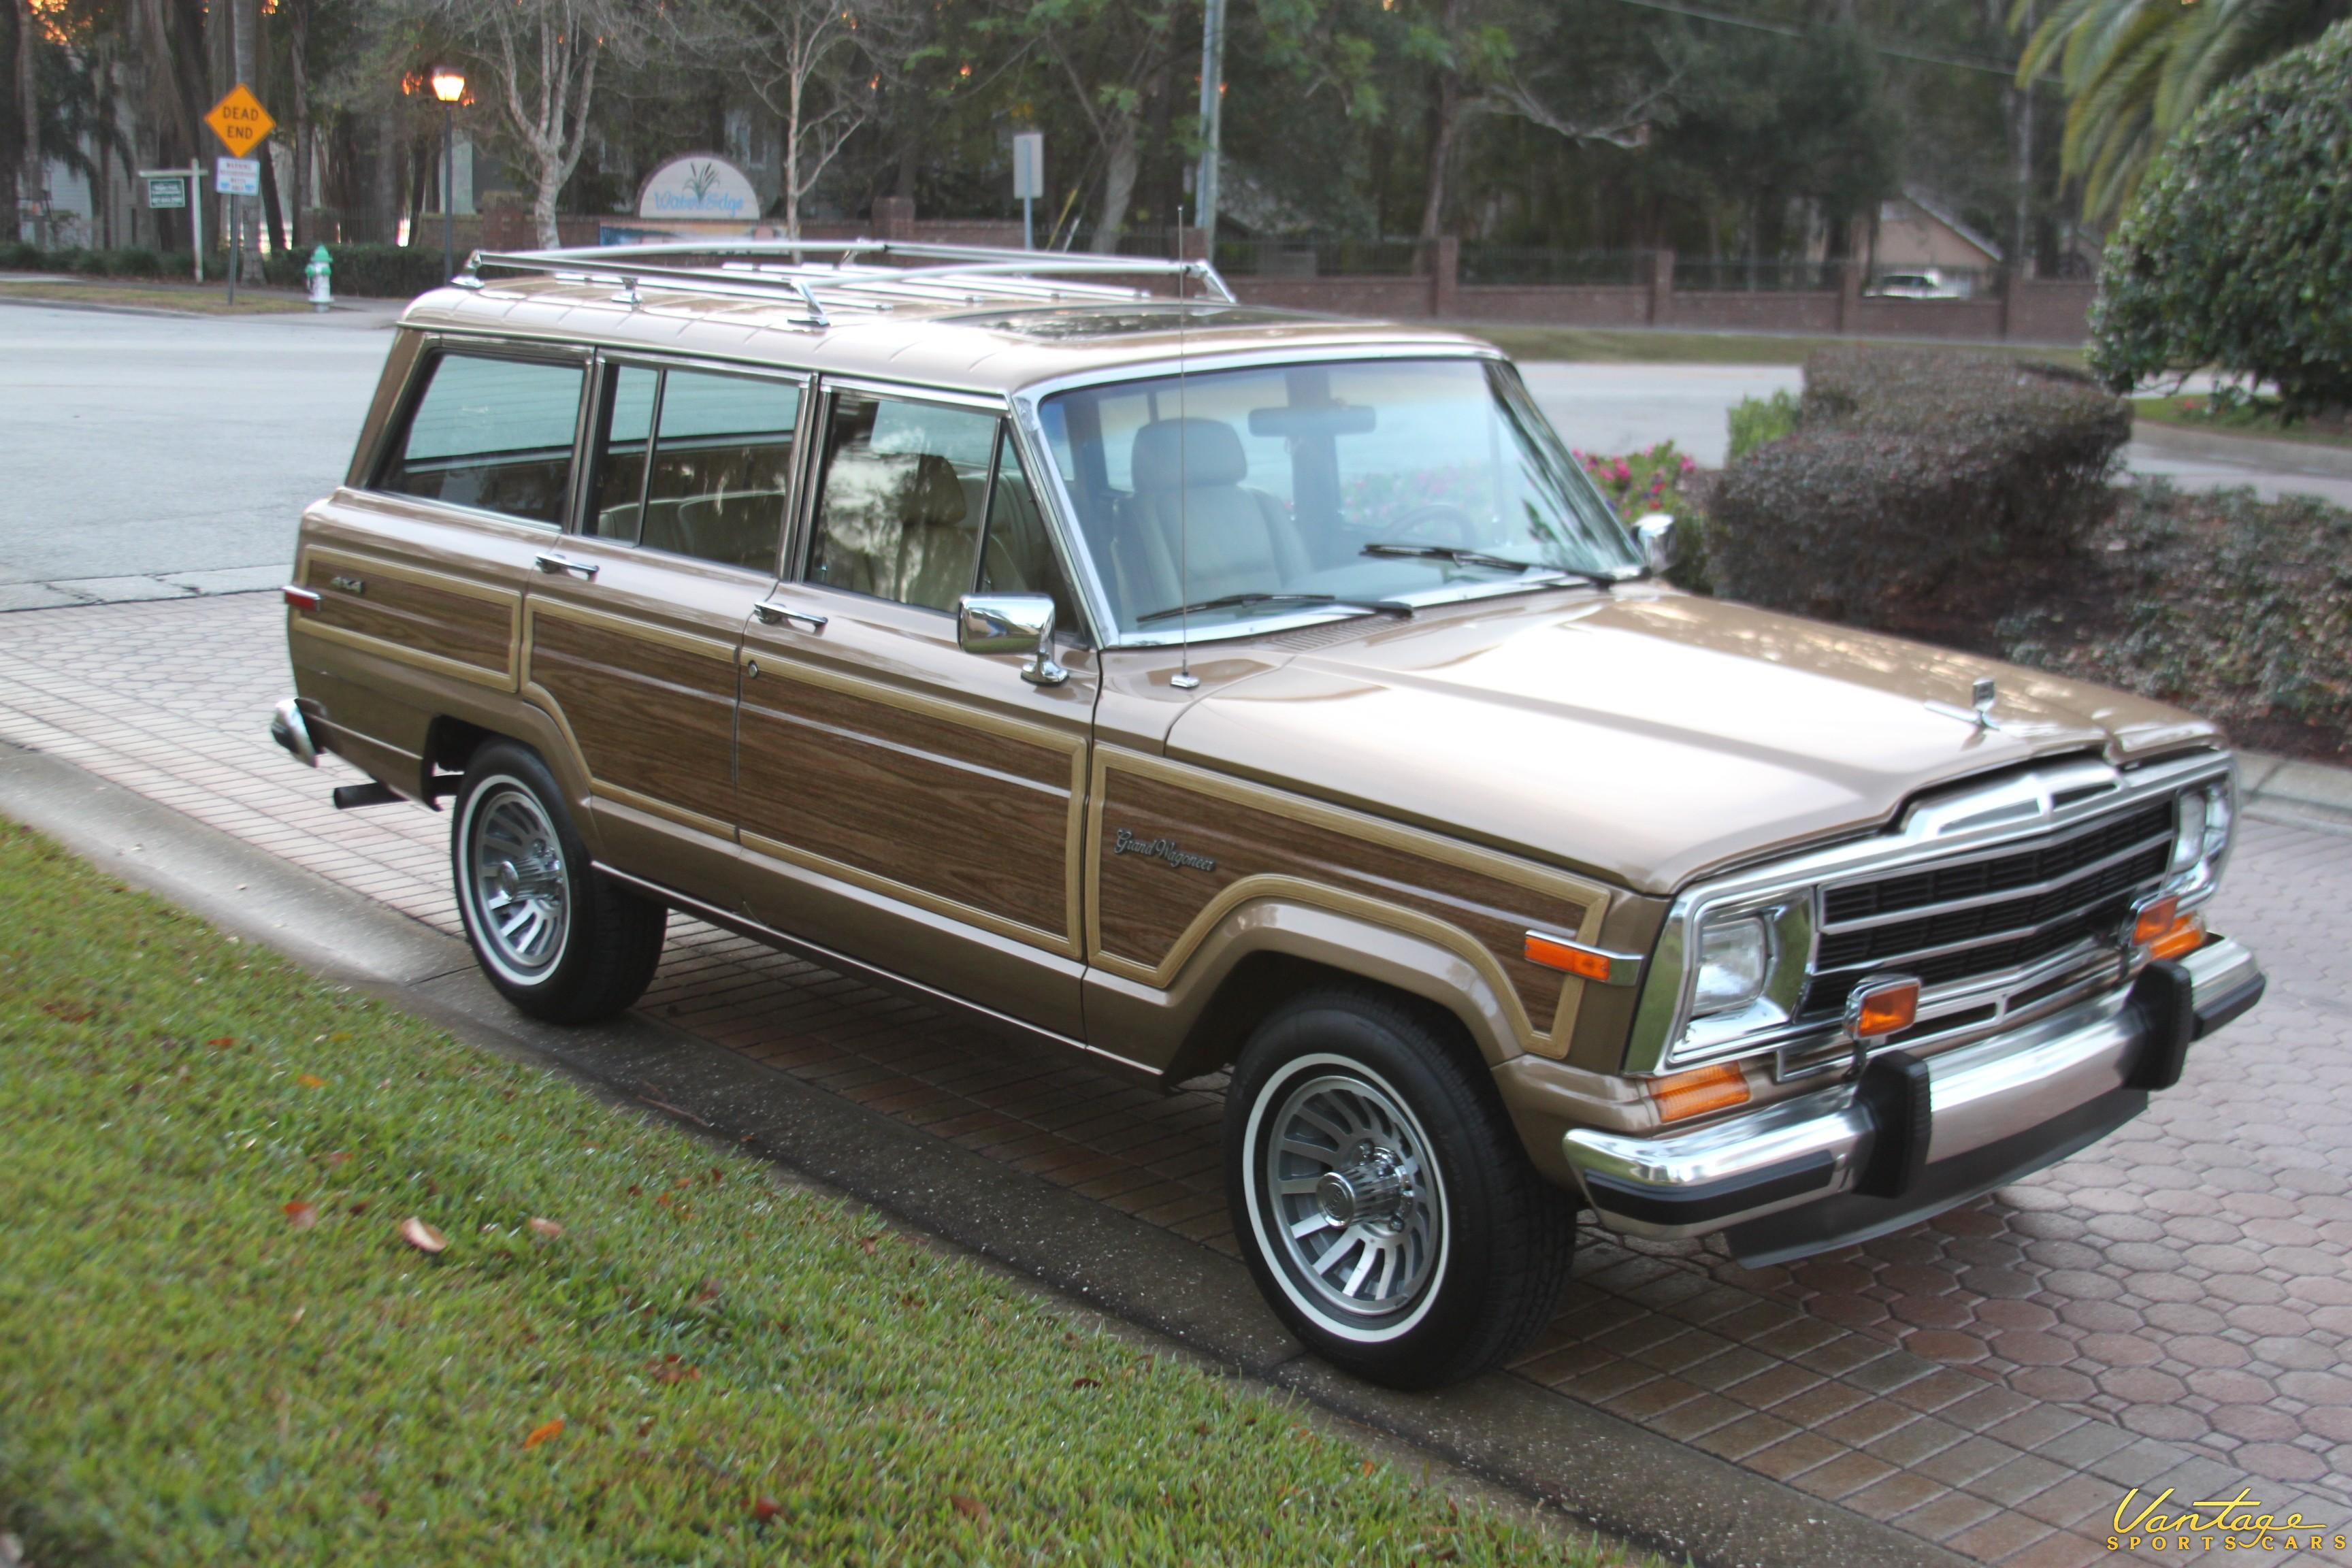 1988 jeep grand wagoneer sold vantage sports cars. Black Bedroom Furniture Sets. Home Design Ideas